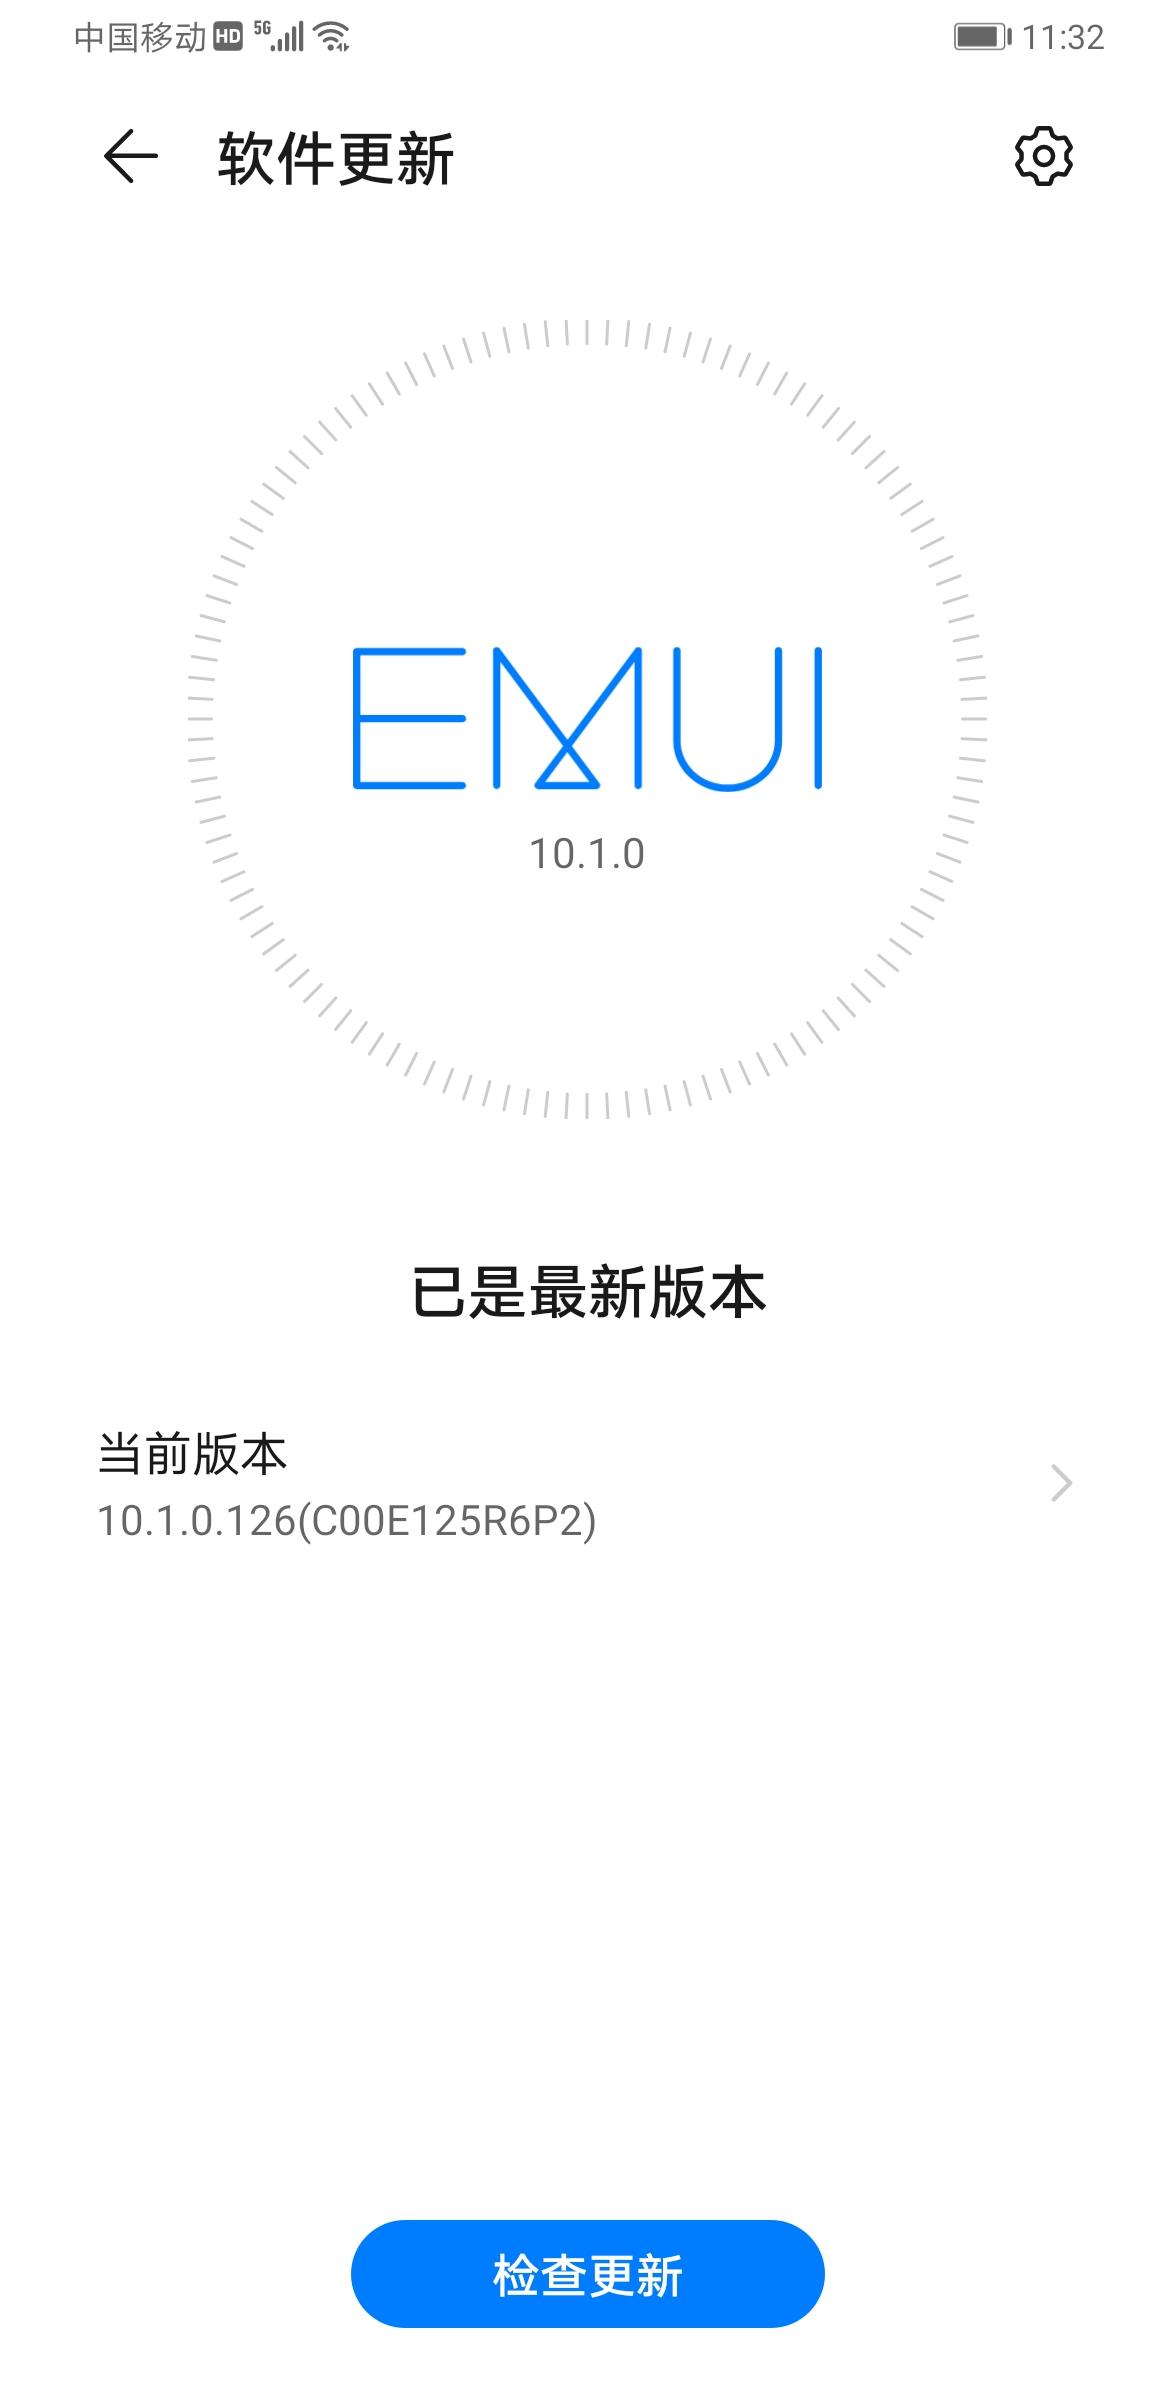 Screenshot_20200508_113249_com.huawei.android.hwouc.jpg